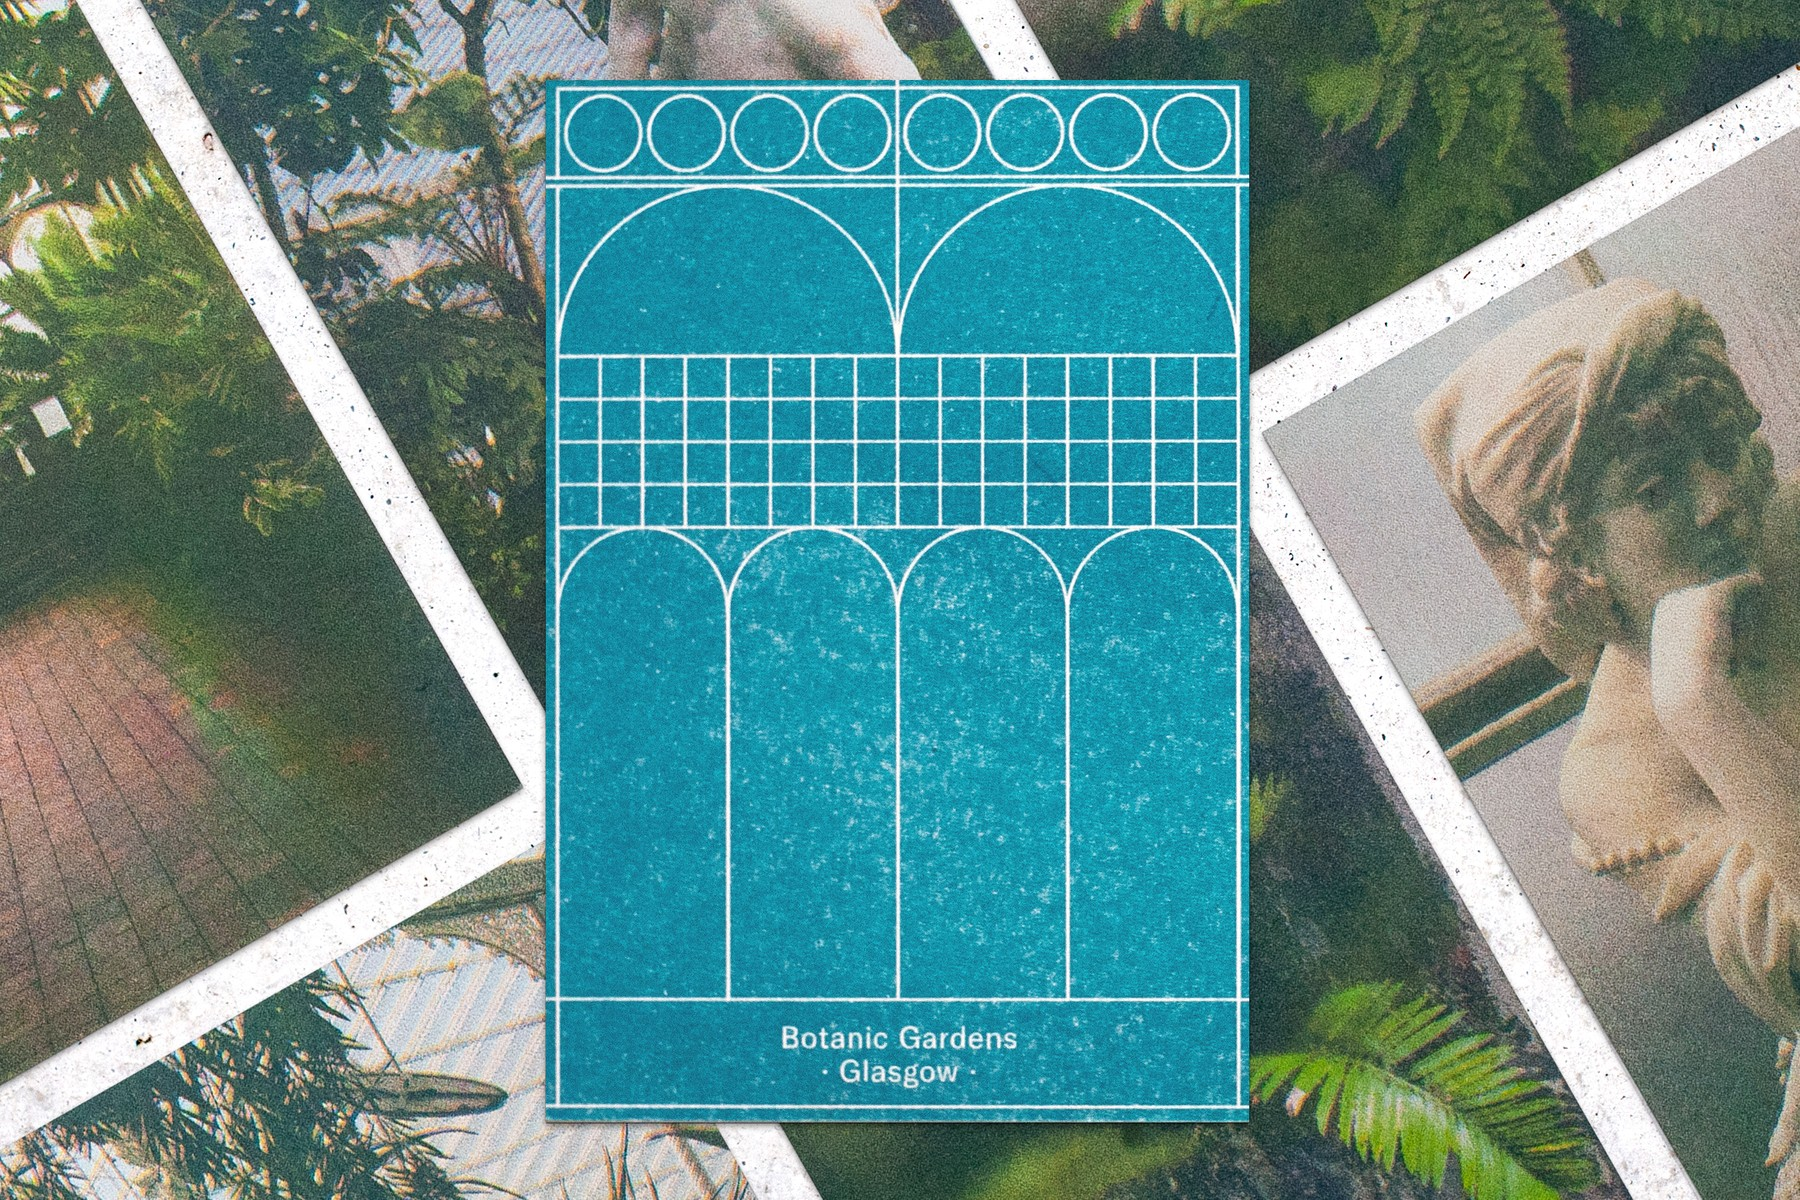 clementine-carriere-prints-risograph-postcards-glasgow-2400x1600-1.jpg